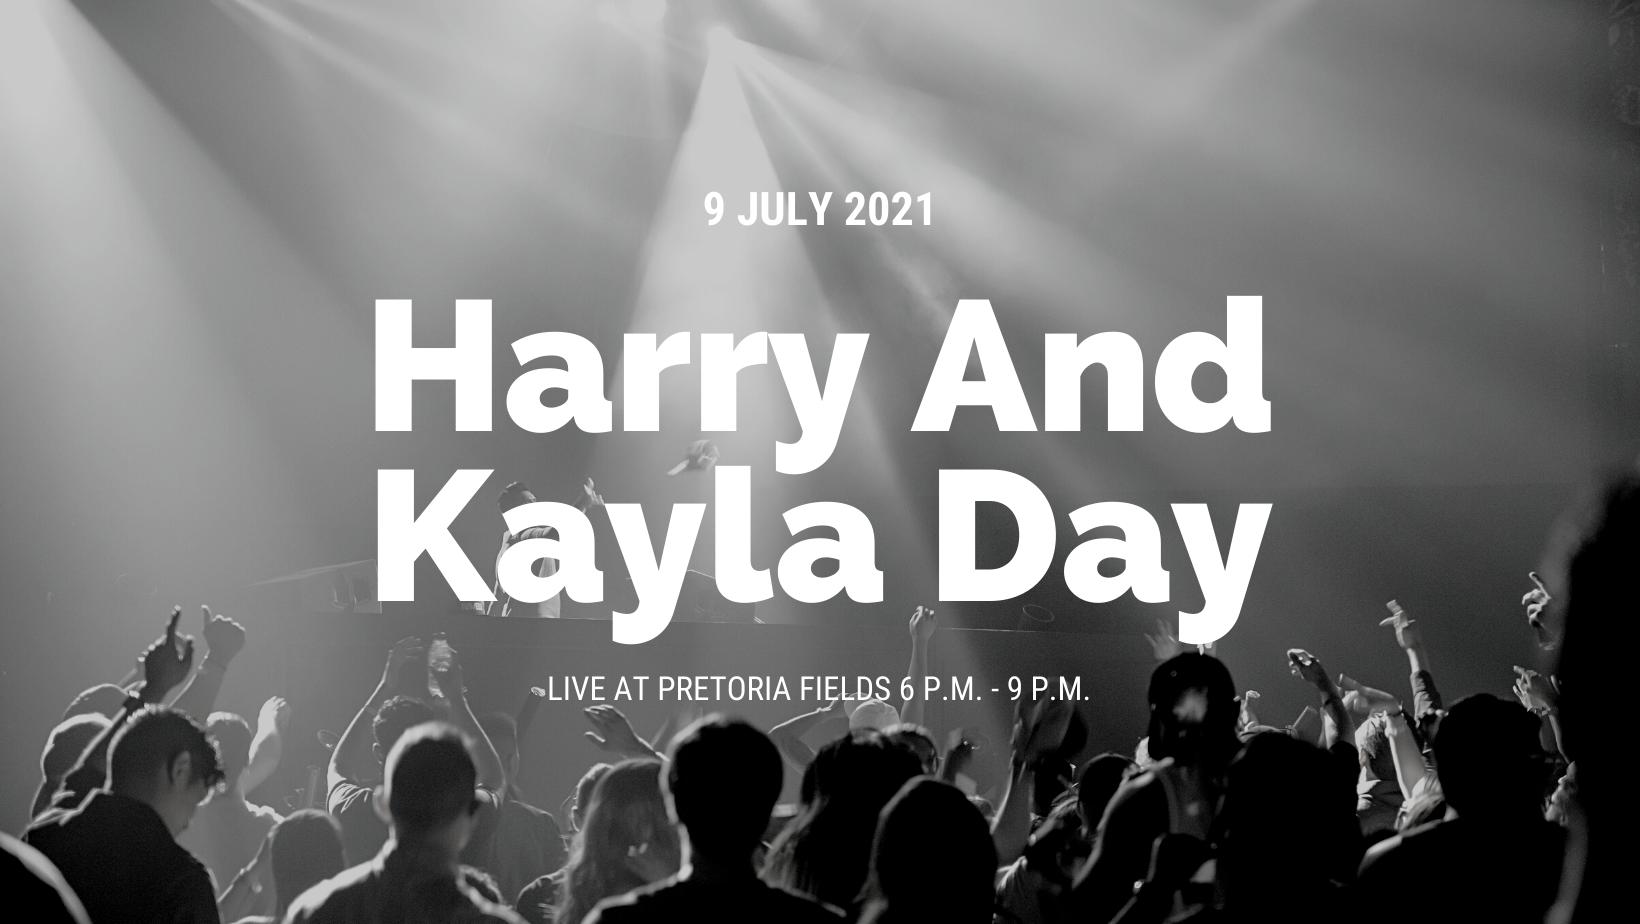 Harry and Kayla Day Live at Pretoria Fields